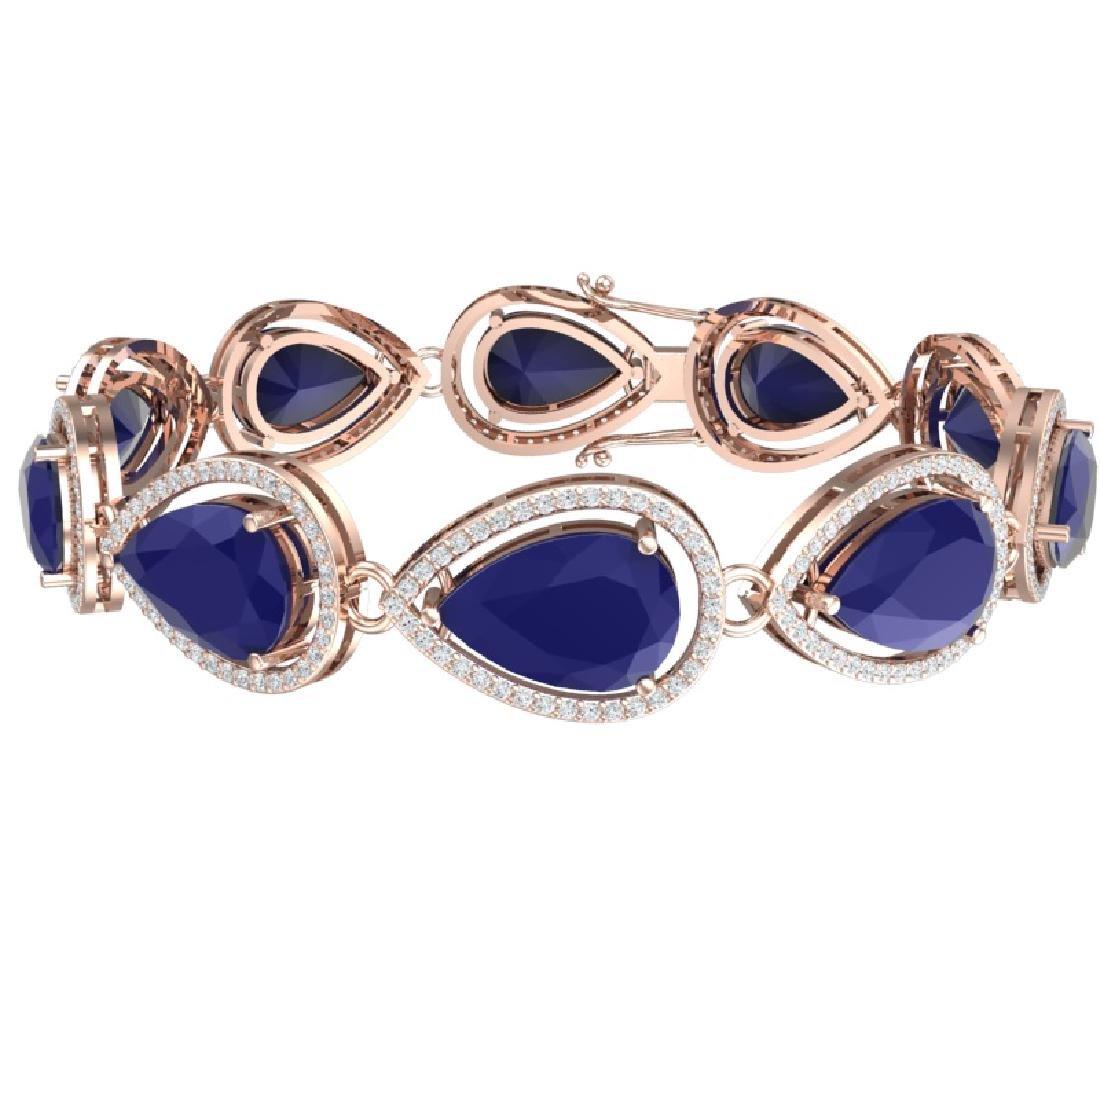 28.31 CTW Royalty Sapphire & VS Diamond Bracelet 18K - 3